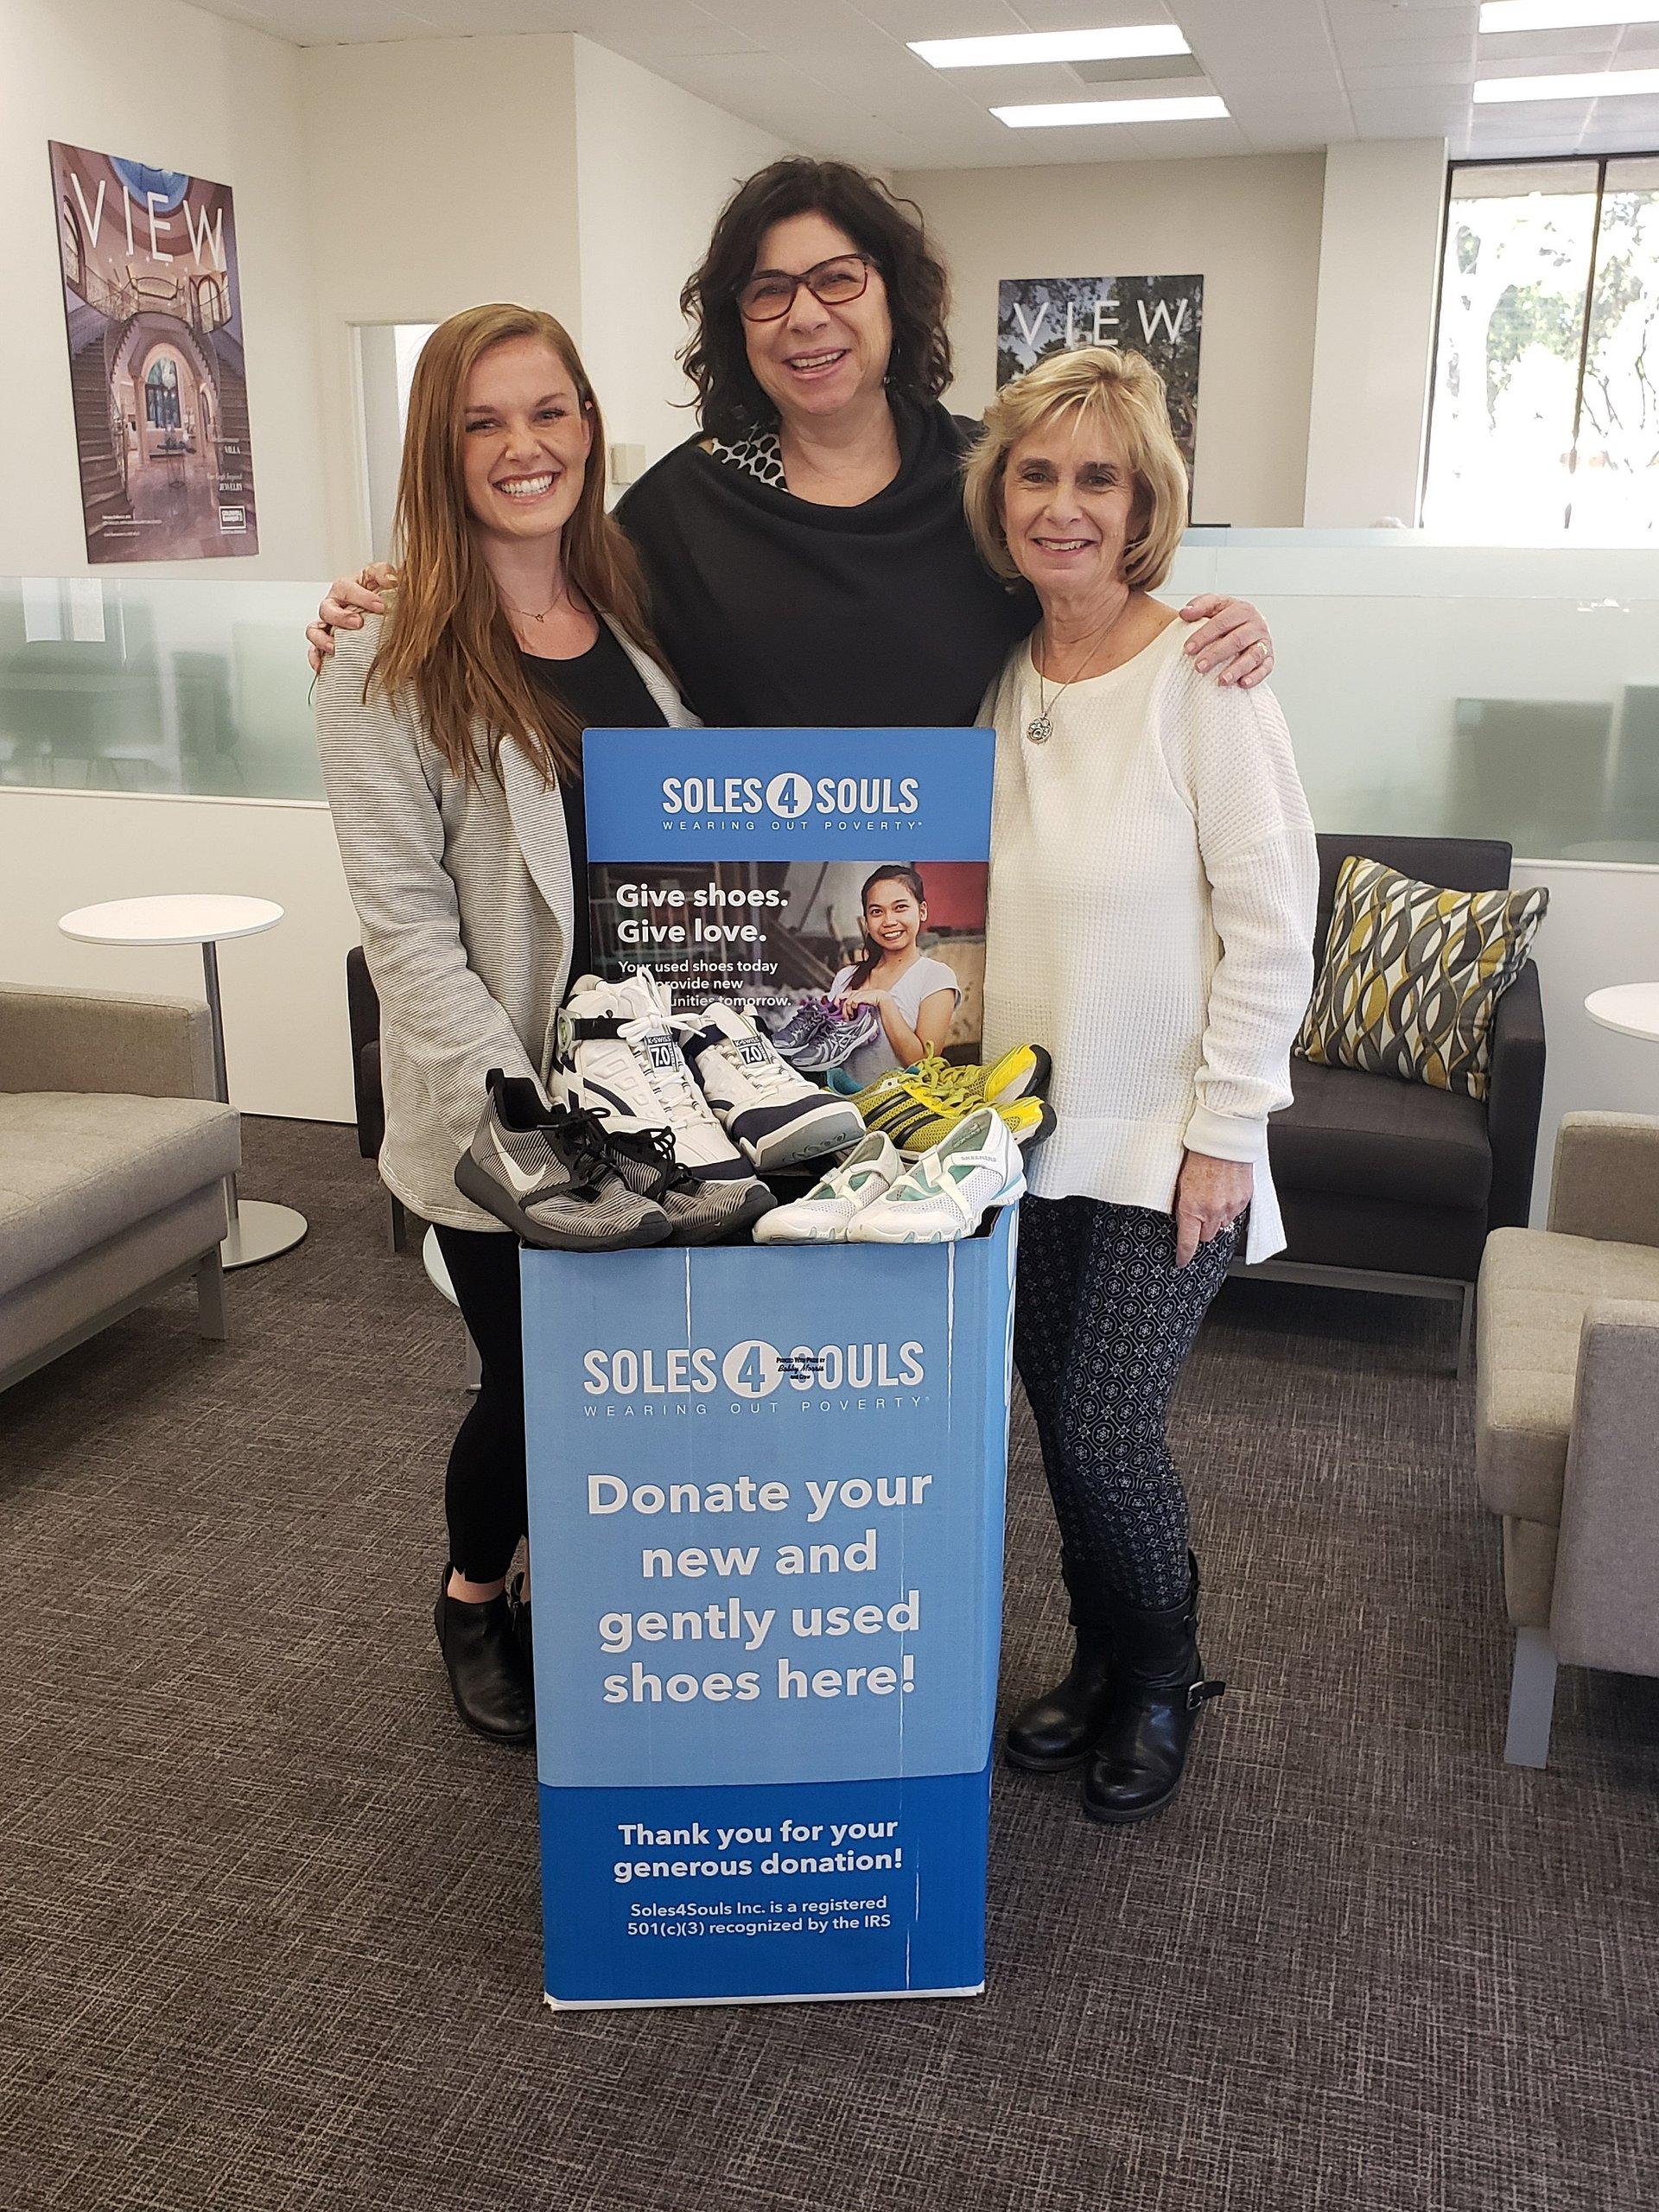 Coldwell Banker's Cathy & Michelle Gerrard Host Shop & Drop Shoe Donation Event for Soles4Souls at Westlake Shoes, Jan. 25